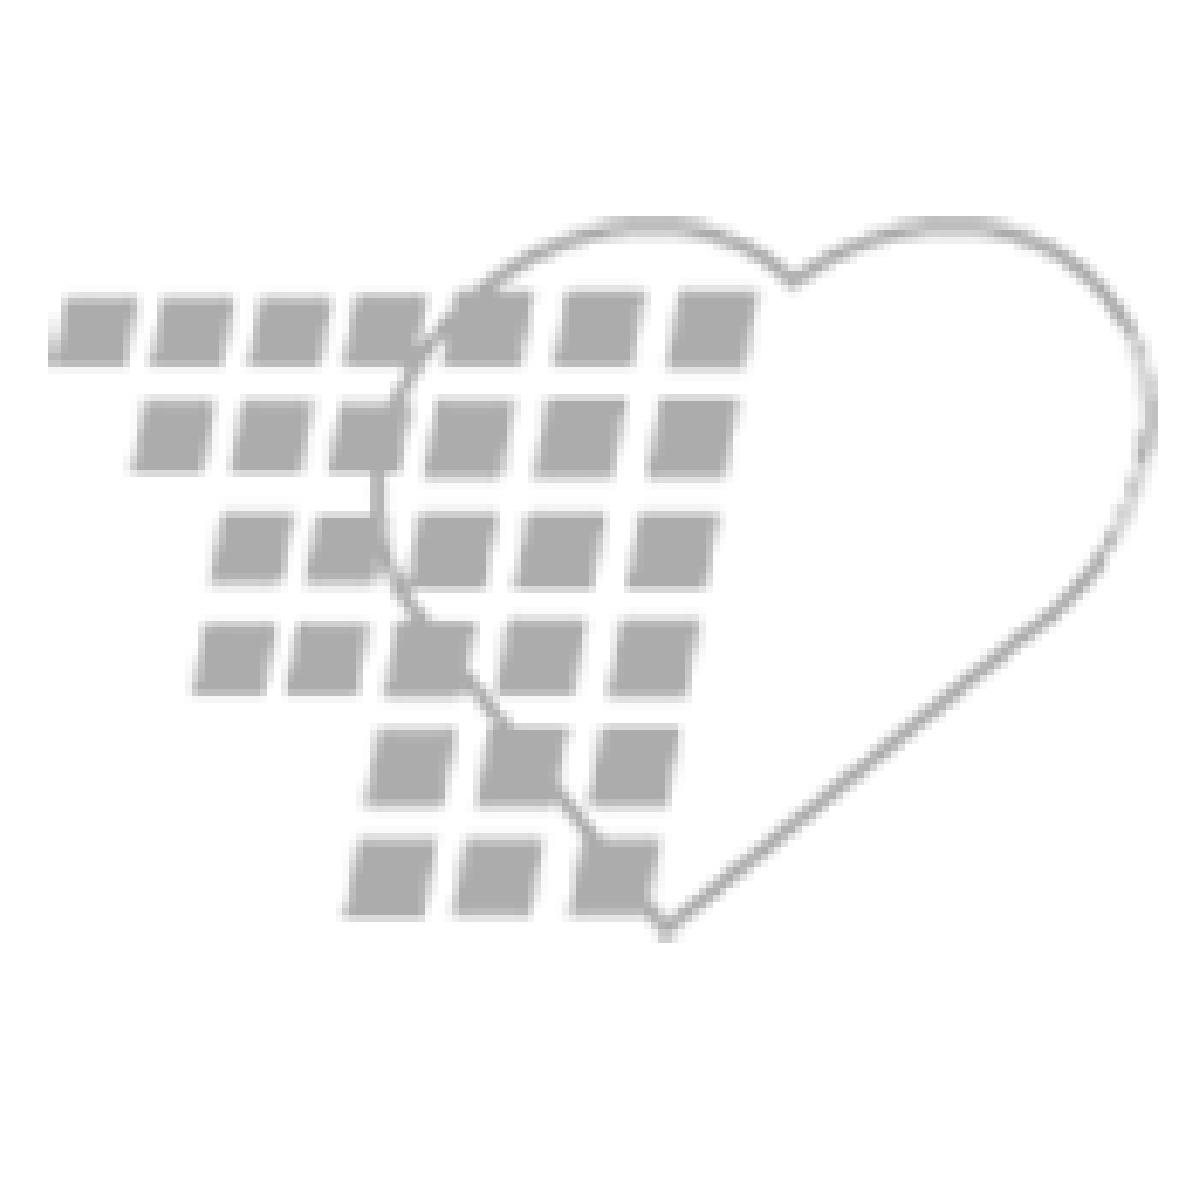 "06-82-0221 - Multi-Sample Needle (Black) 22G x 1"" 100/Bx"